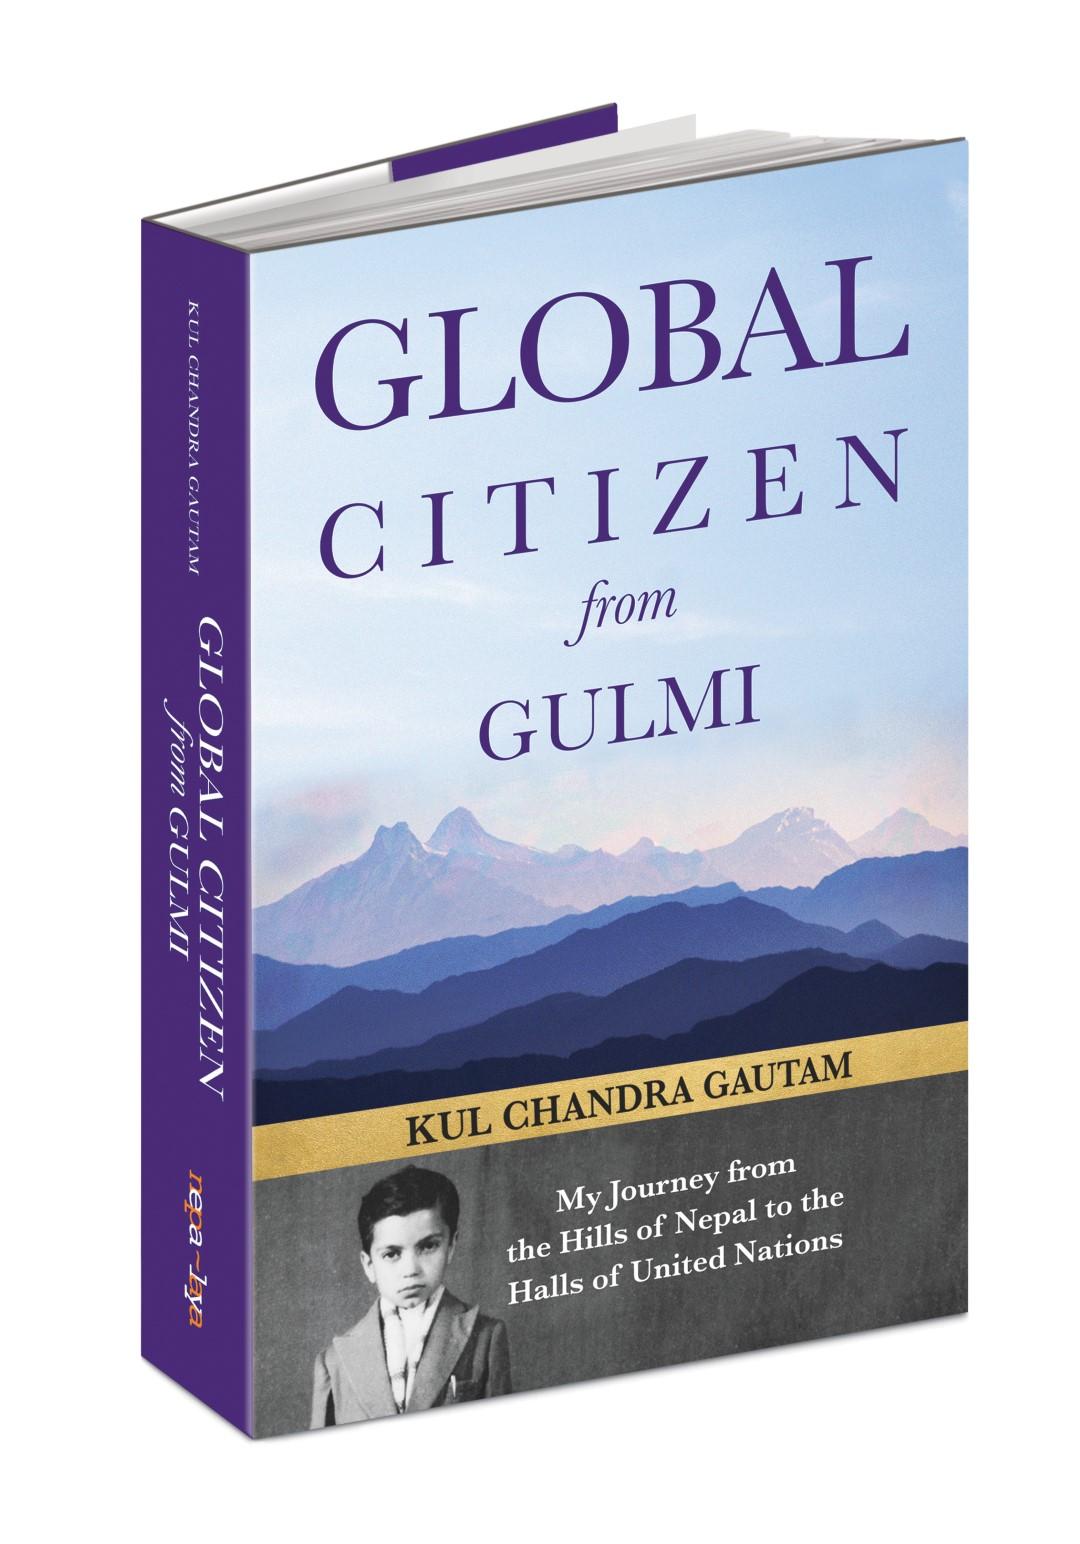 Kul Gautam's memoir prescribed as textbook at a US university